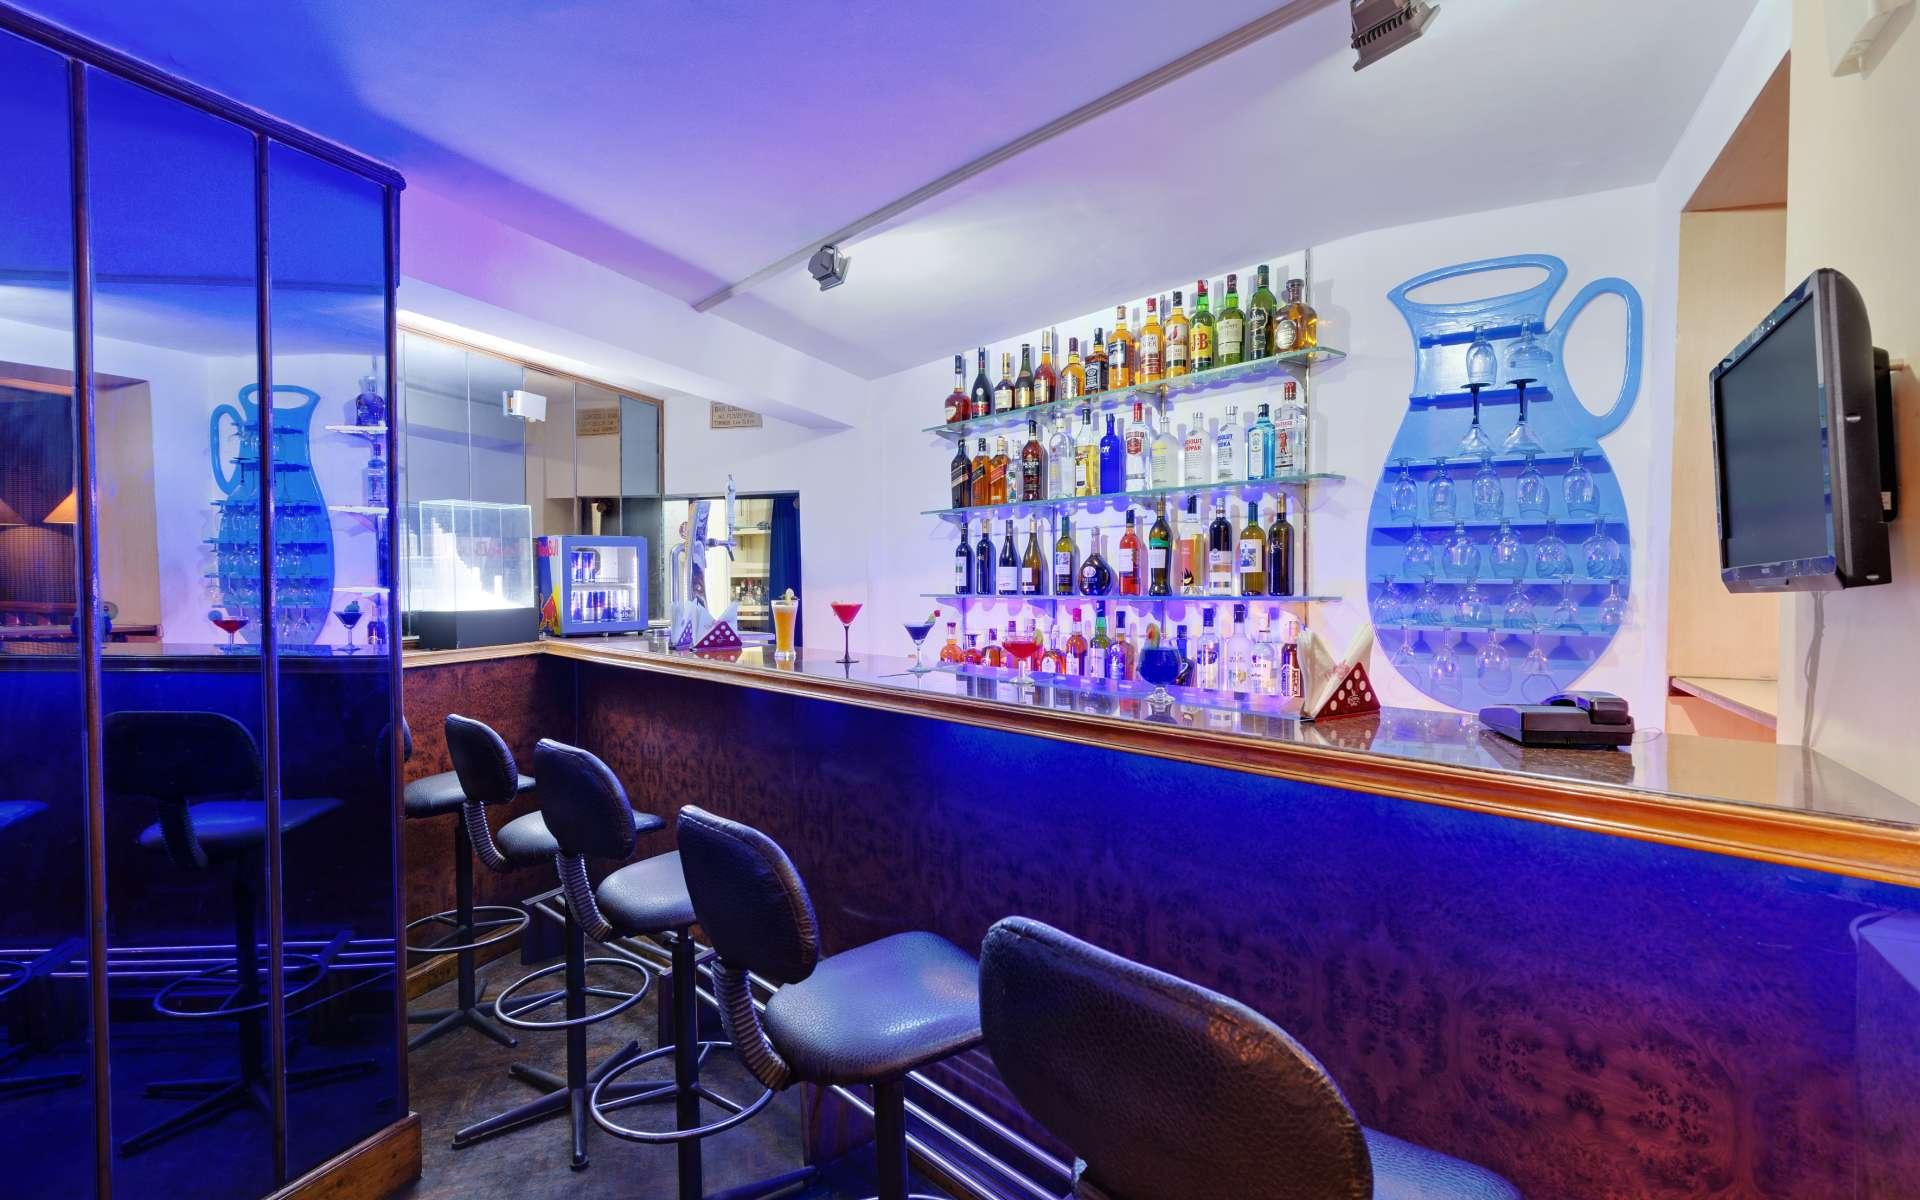 Chennai Society Bar Ambassador Pallava - The Ambassador | Heritage Hotels in Mumbai, Aurangabad, Chennai - The Society Lounge Bar